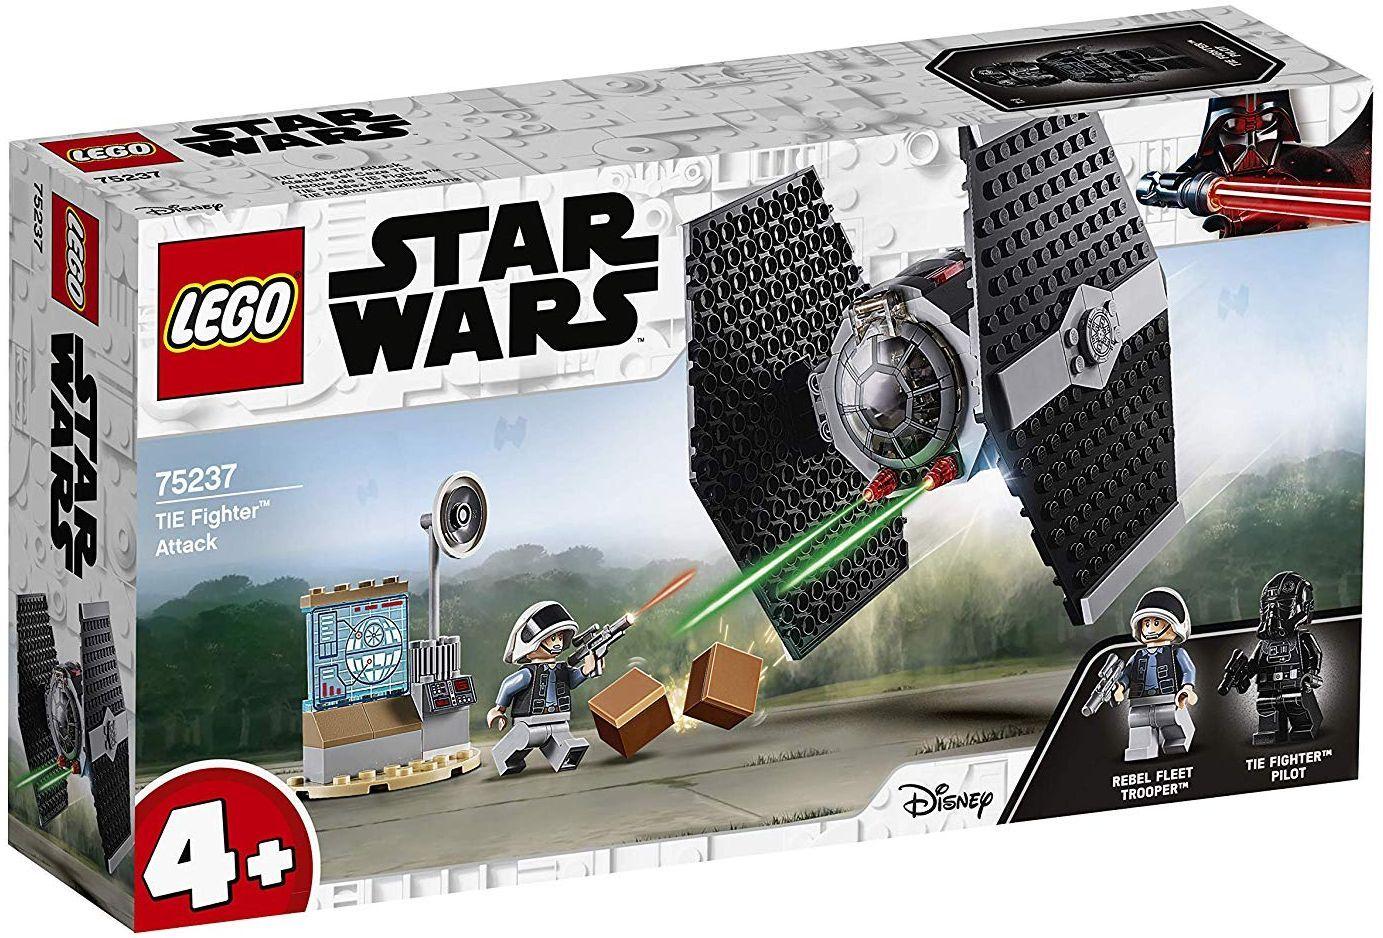 Конструктор Lego Star Wars - TIE Fighter Attack (75237) - 7